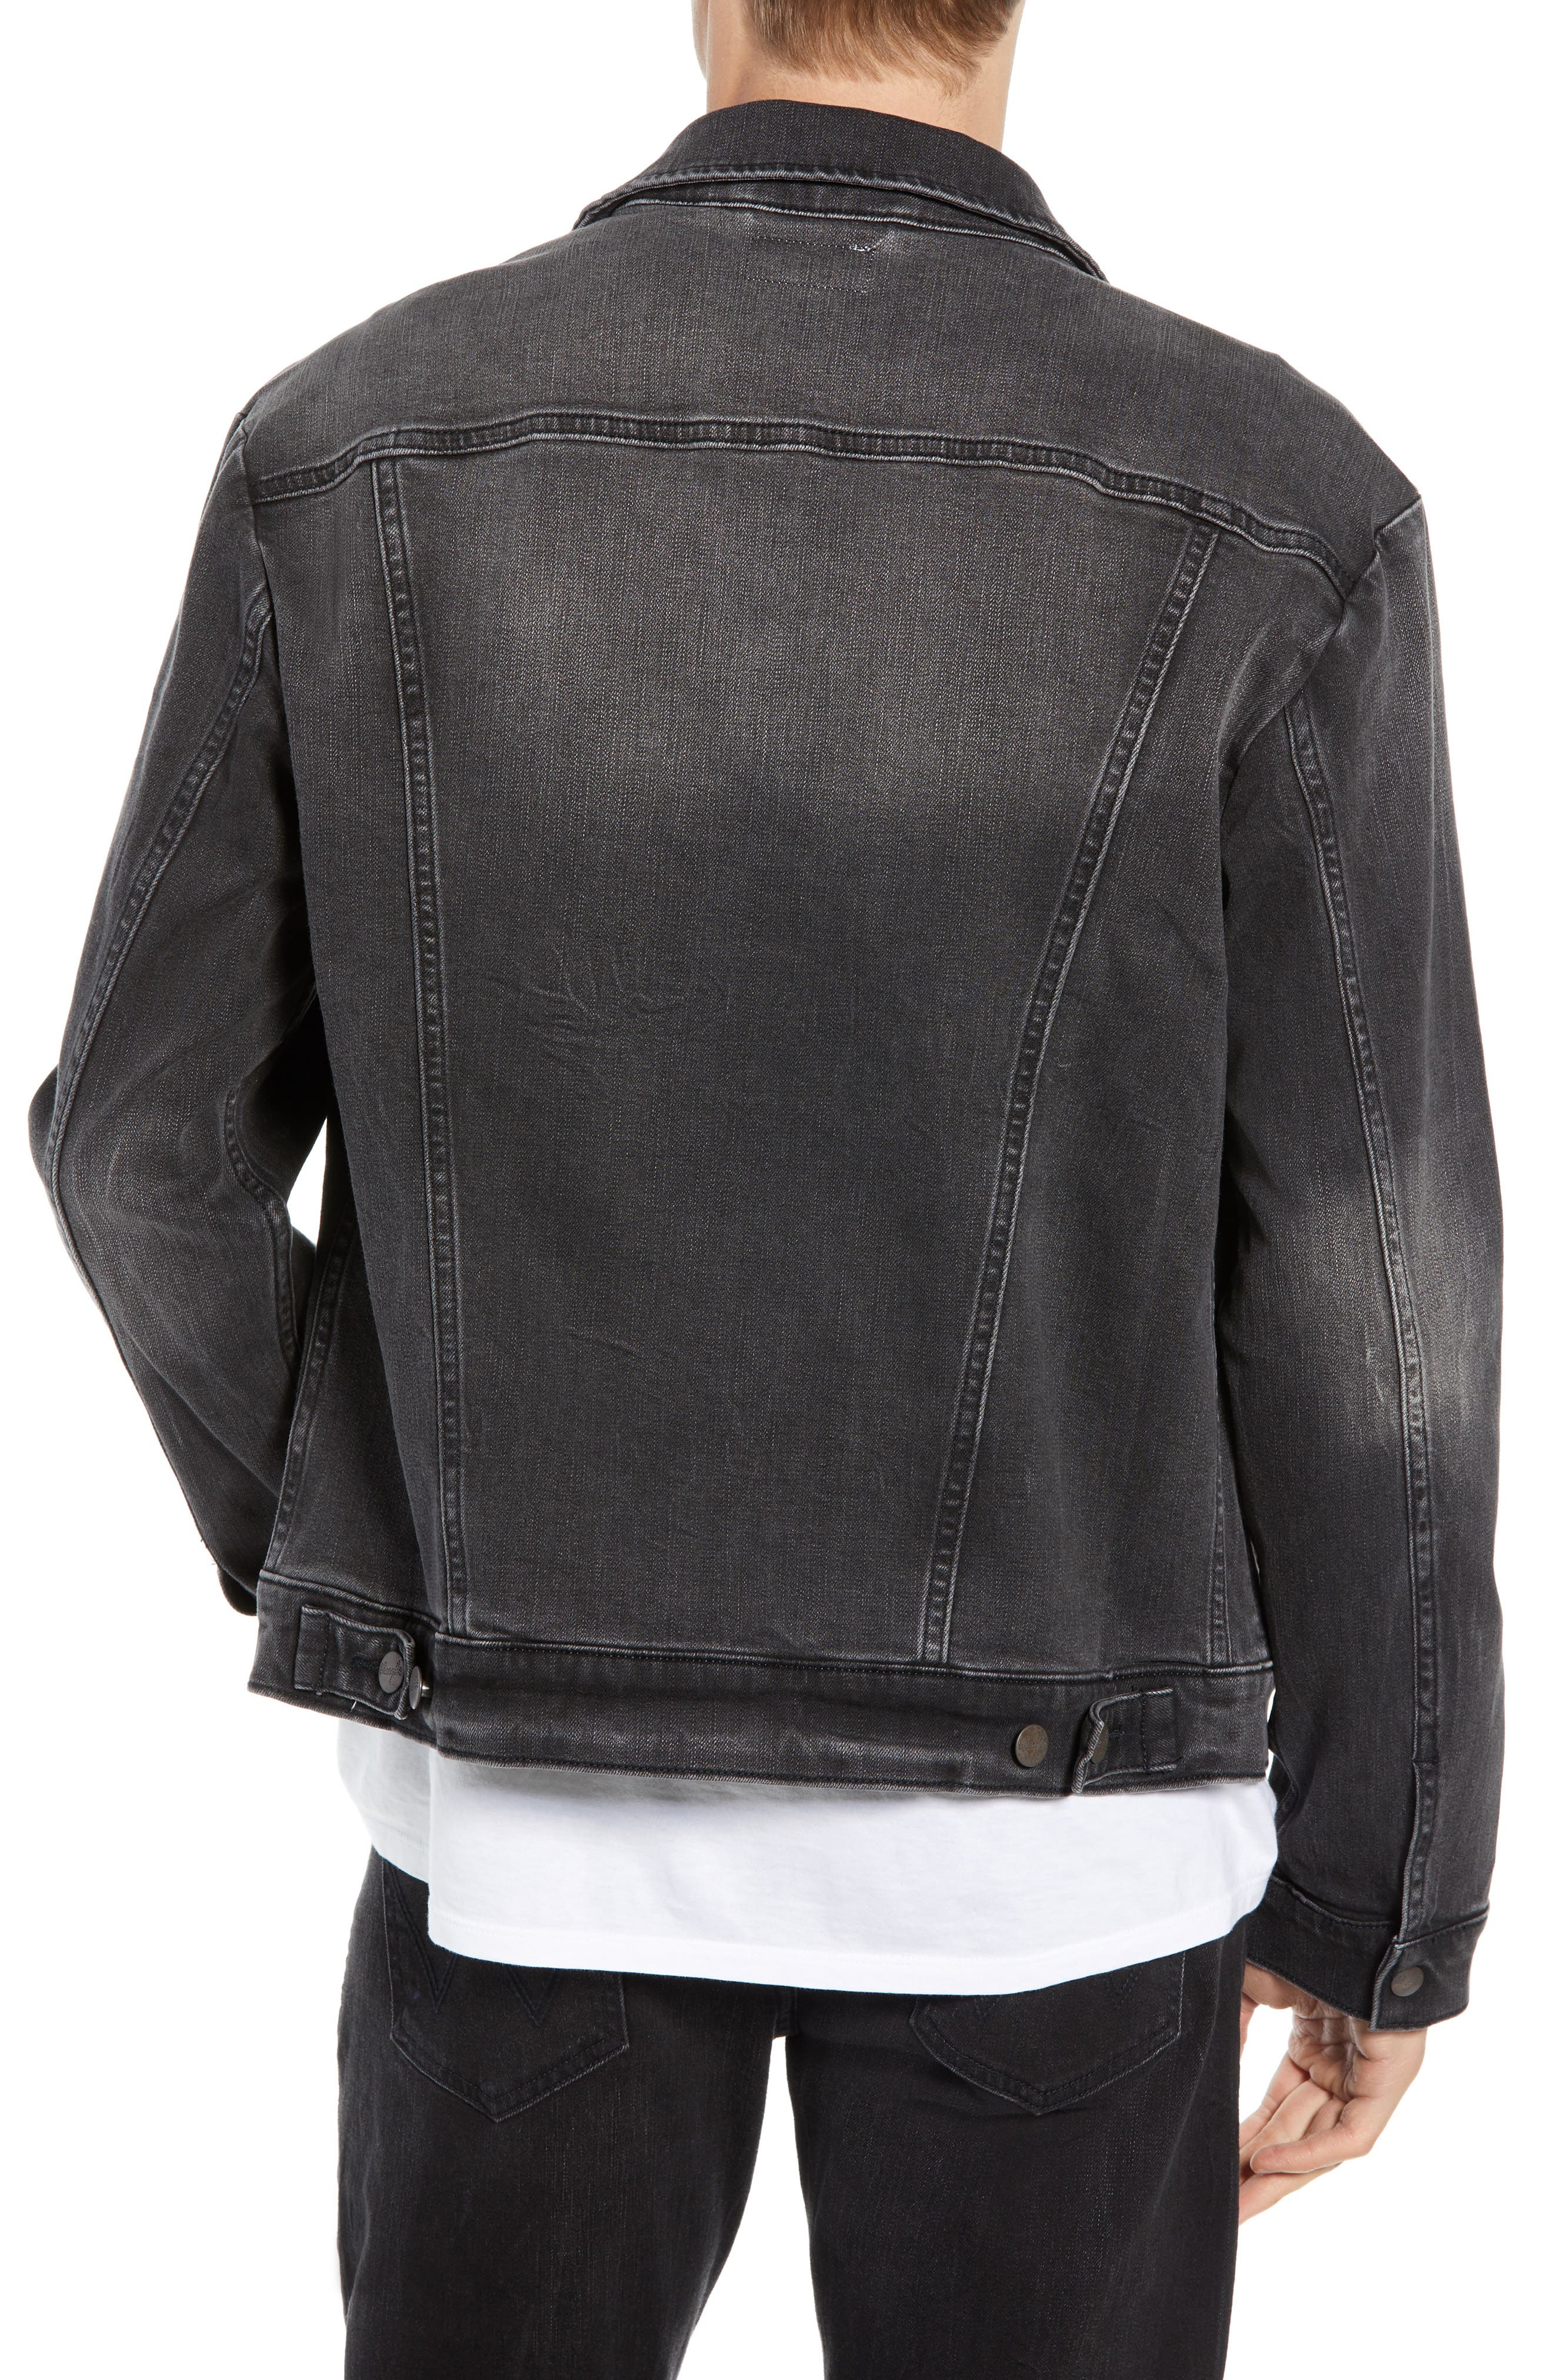 WRANGLER, Heritage Pleated Denim Jacket, Alternate thumbnail 2, color, 020